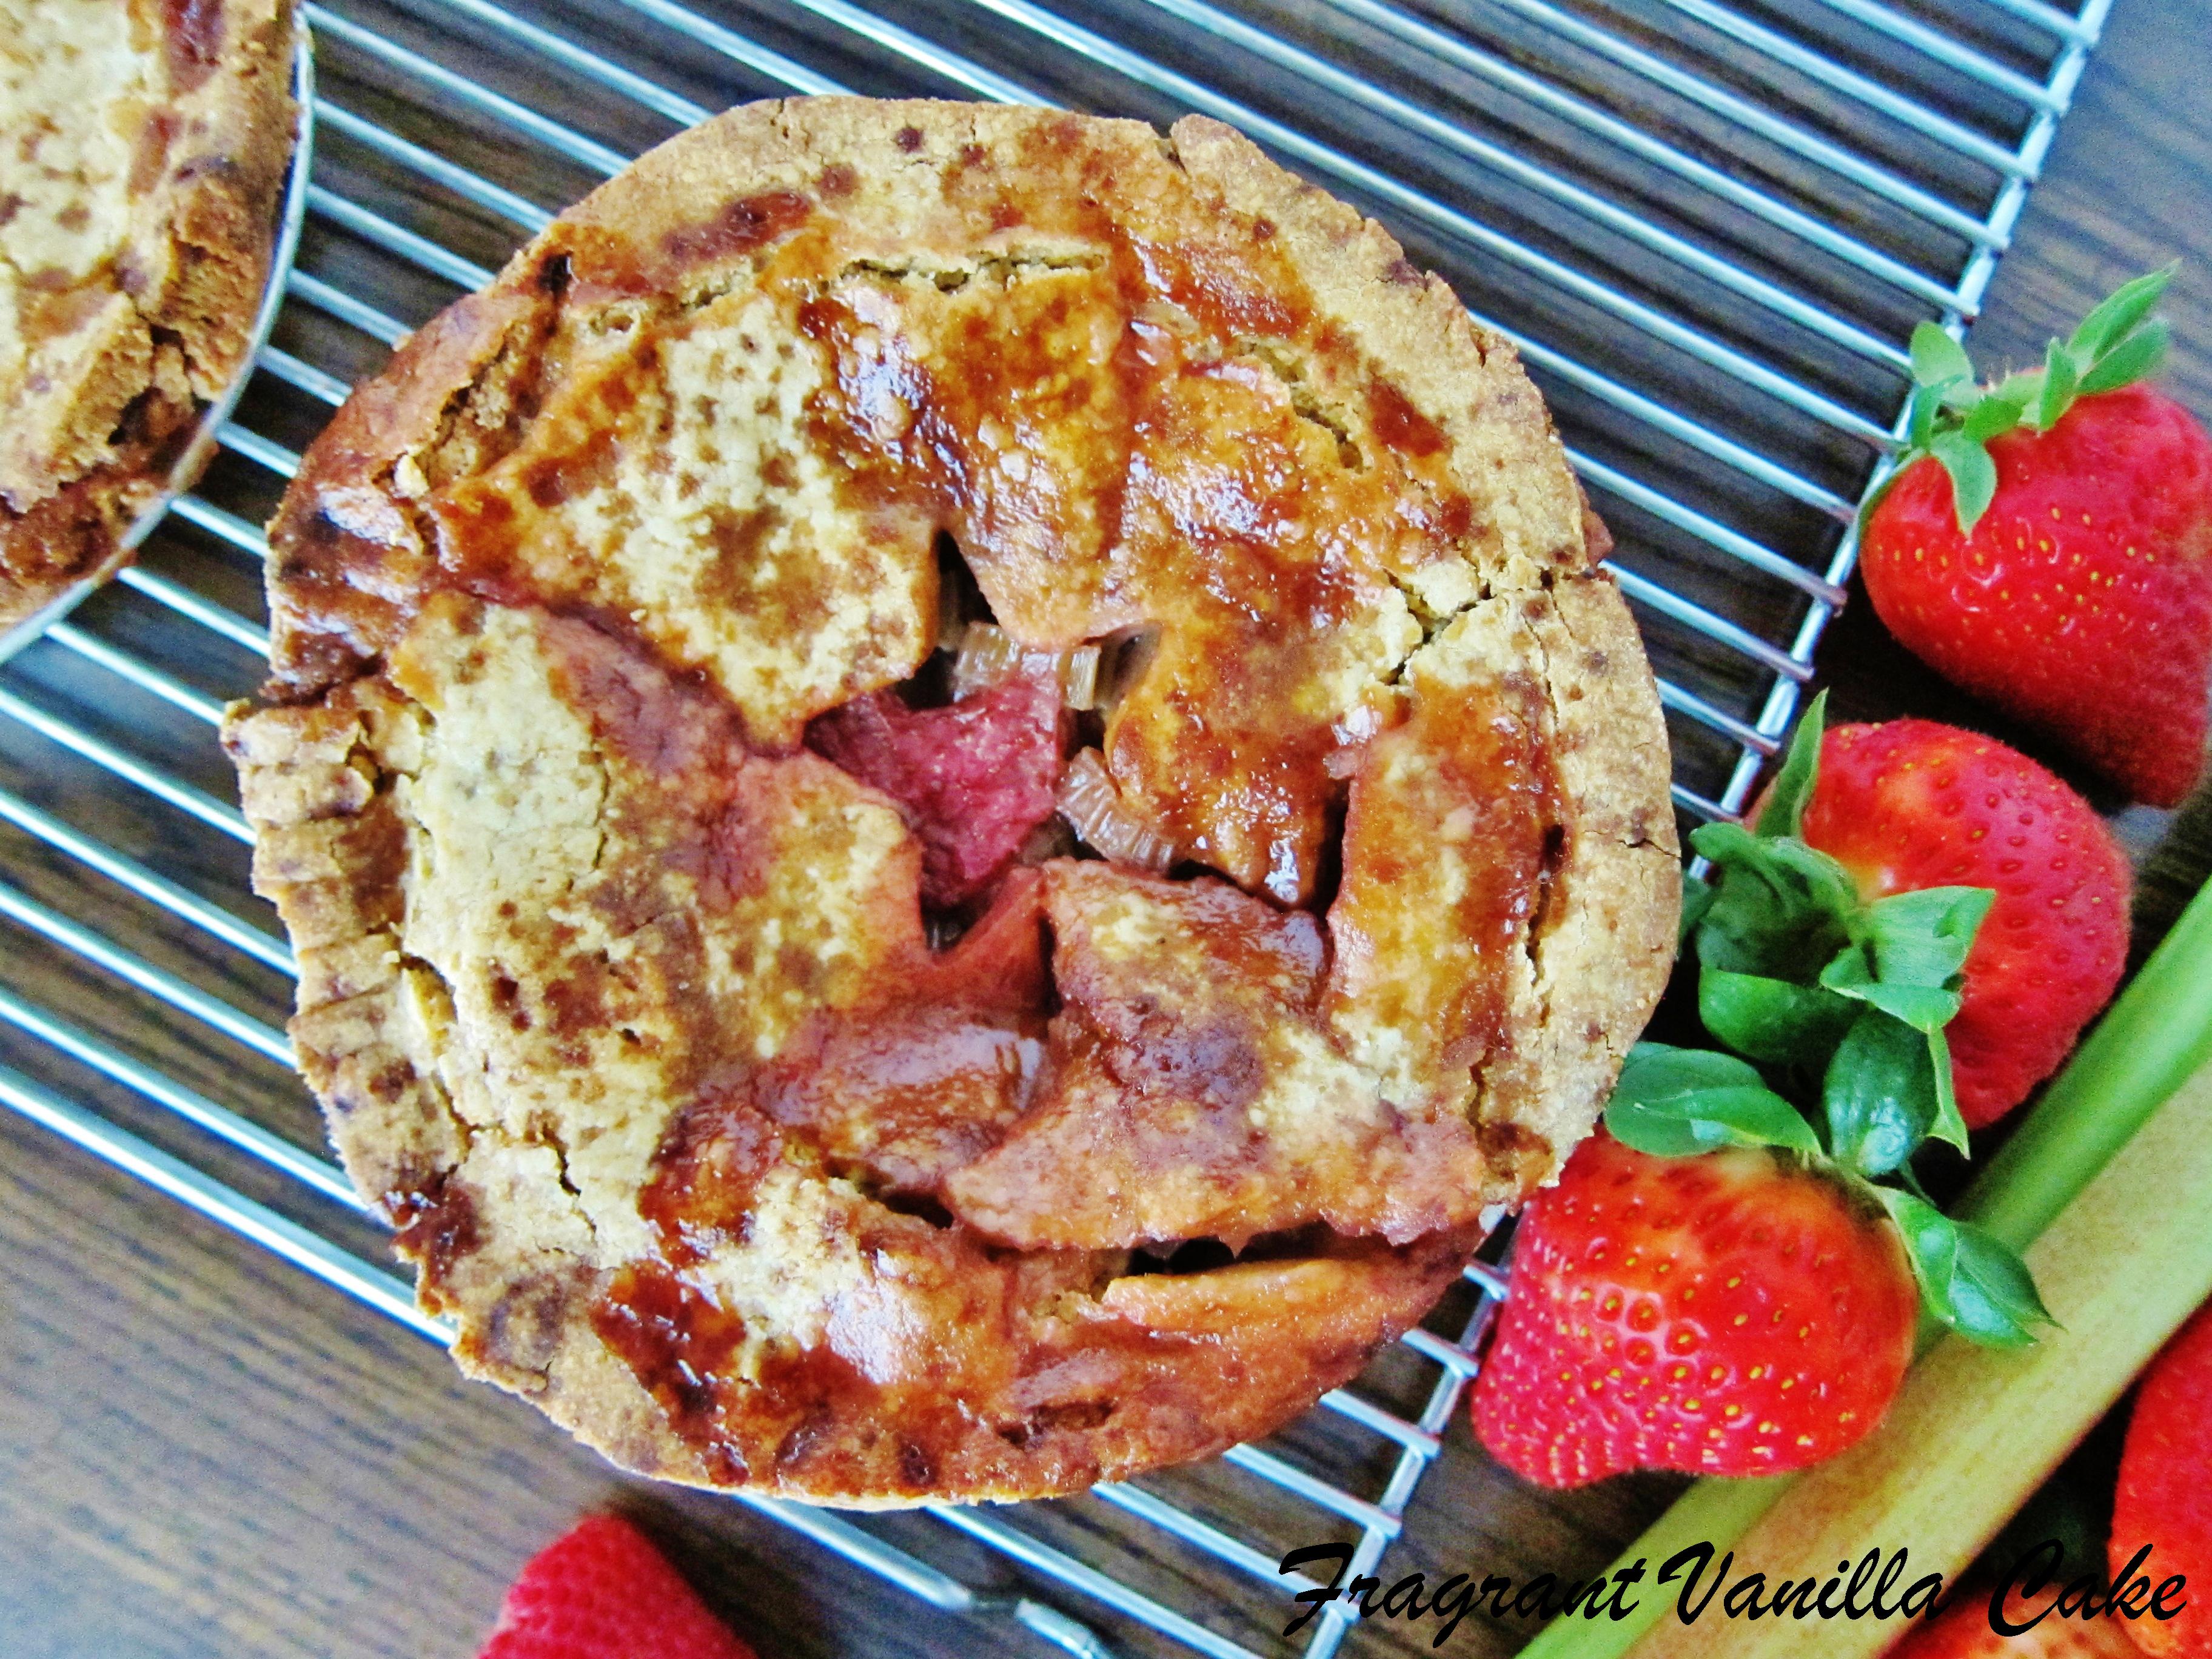 Vegan Strawberry Rhubarb Mini Pies with Lemon Crust